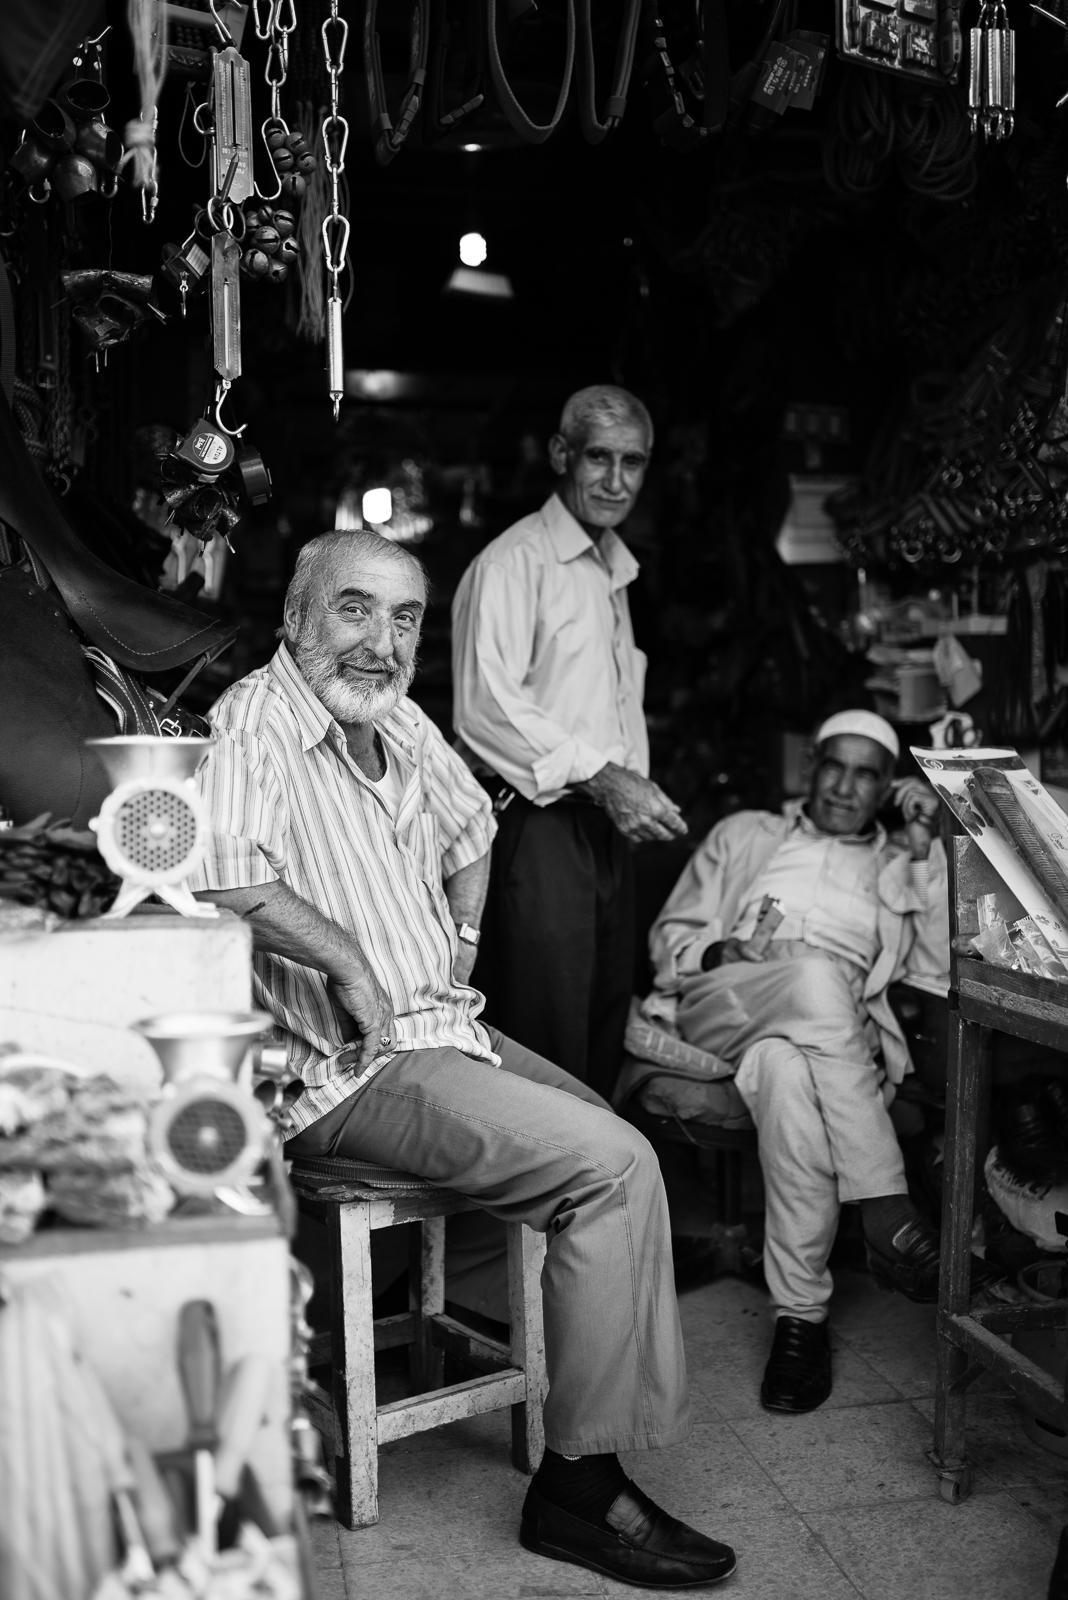 City life, Diyarbakir (Turkey)